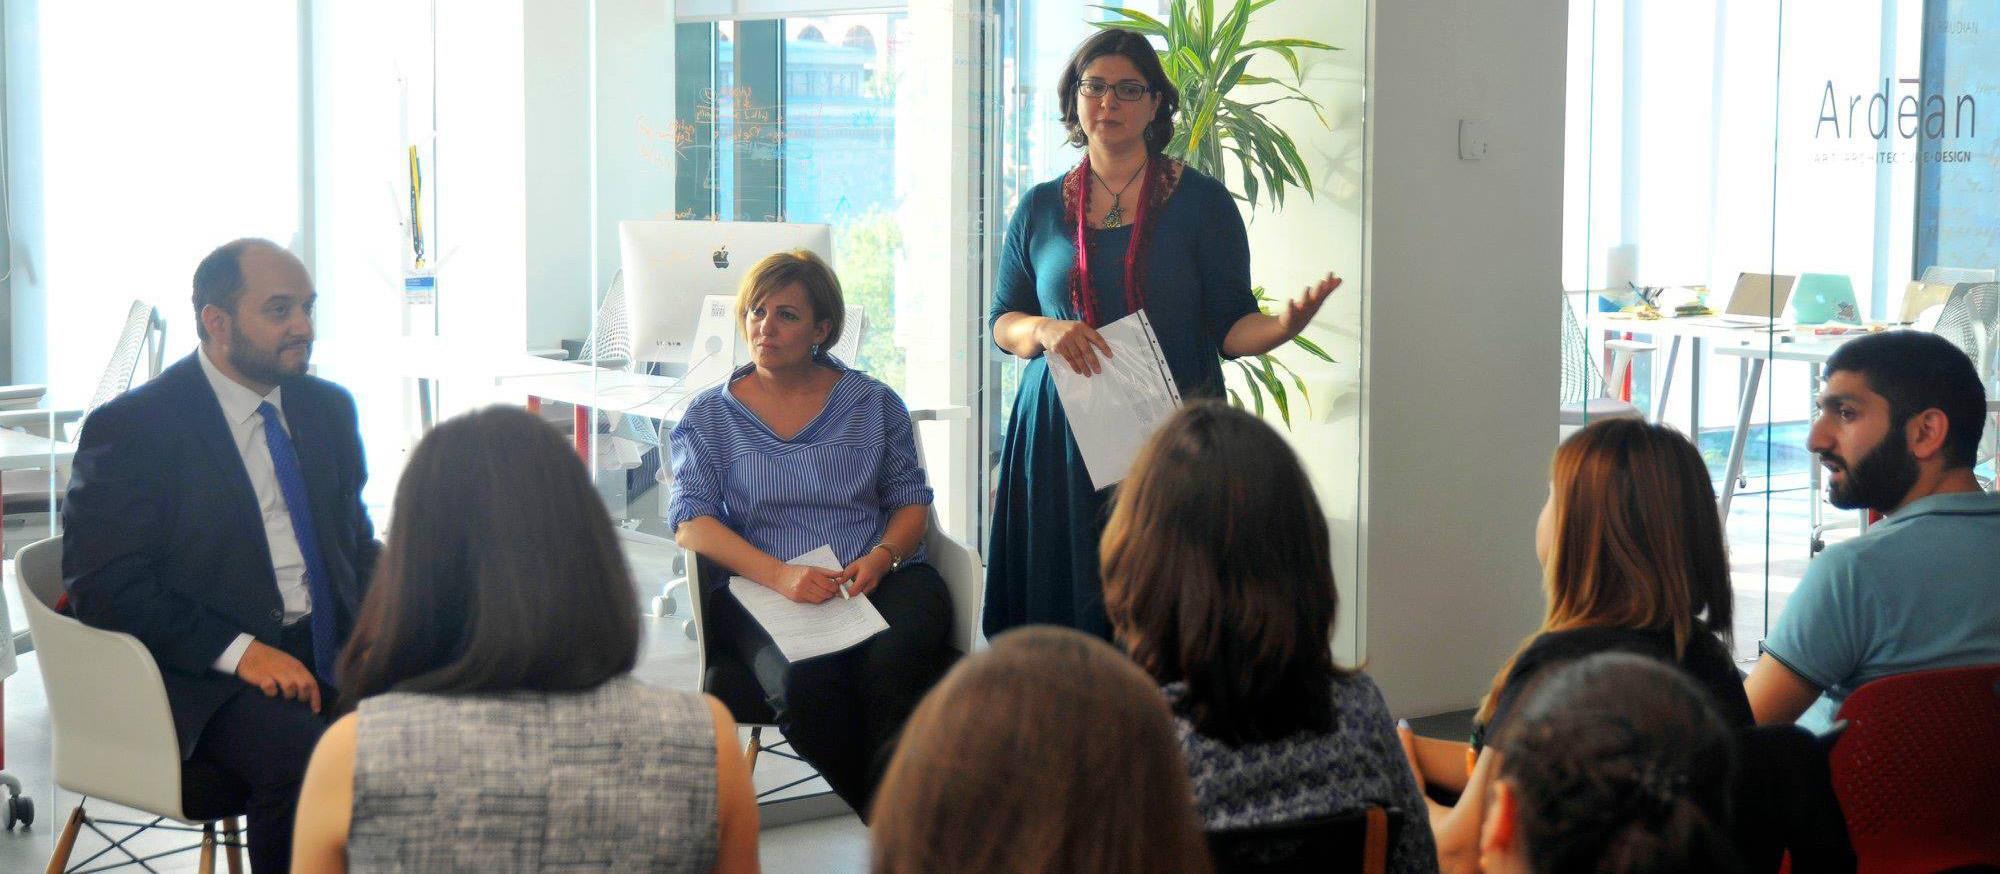 Professional facilitation at Impact Hub Yerevan